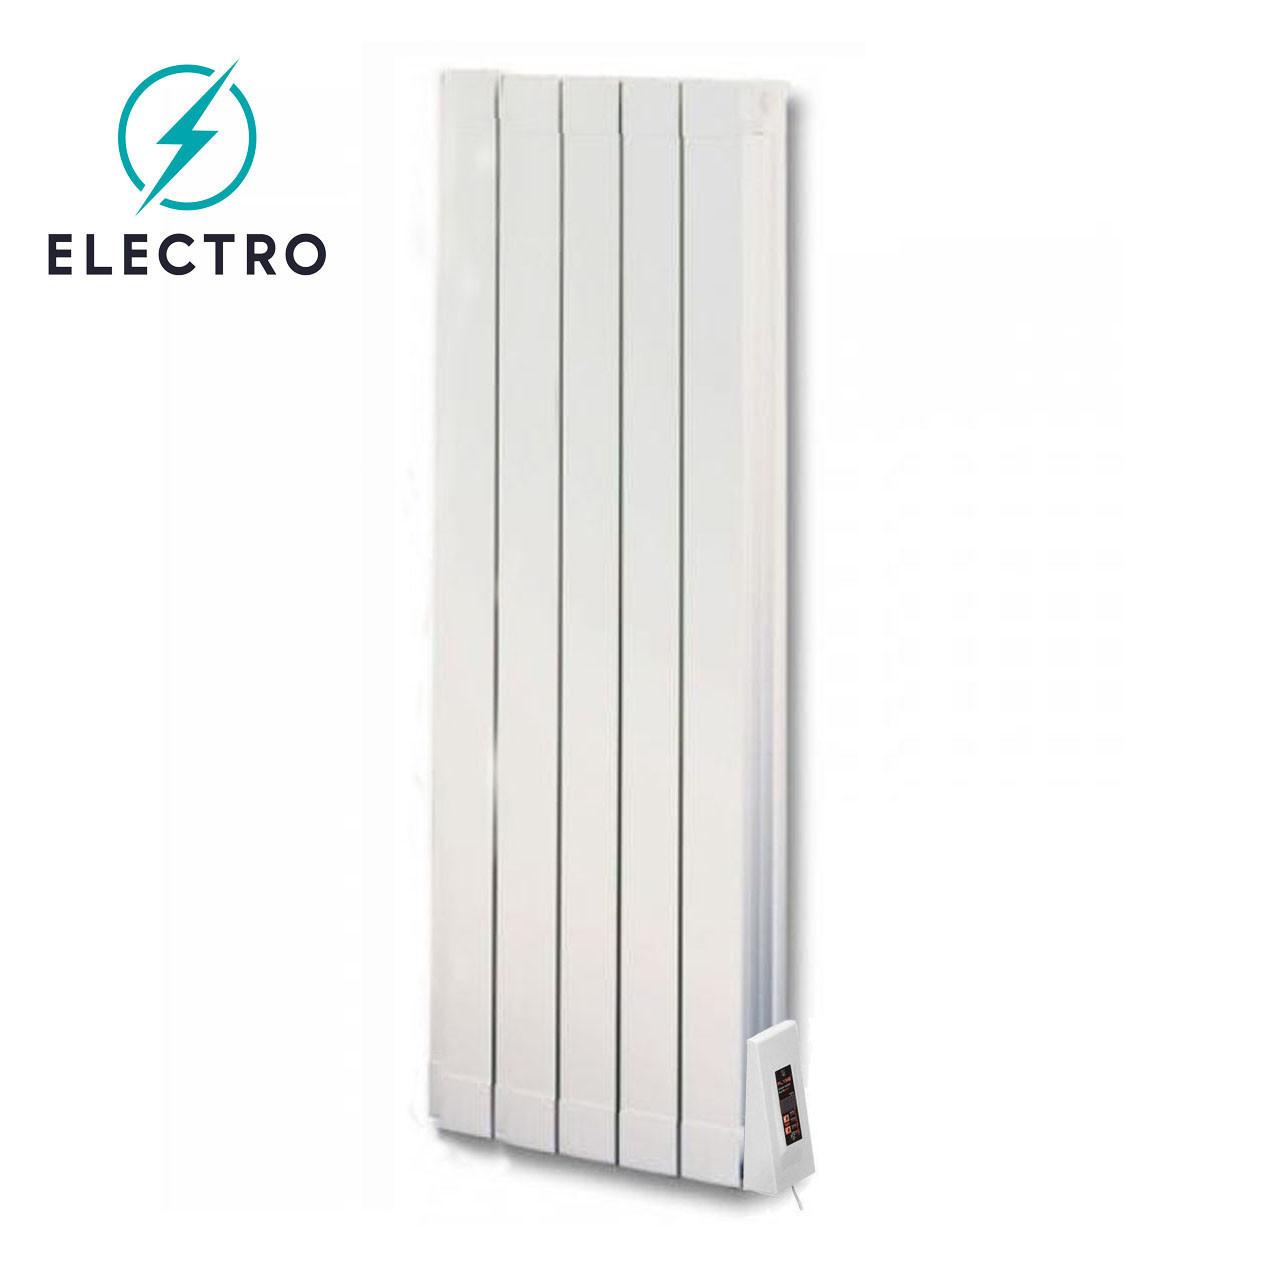 Электрорадиатор ELECTRO.G5W, премиум 1400/96 (250Вт)